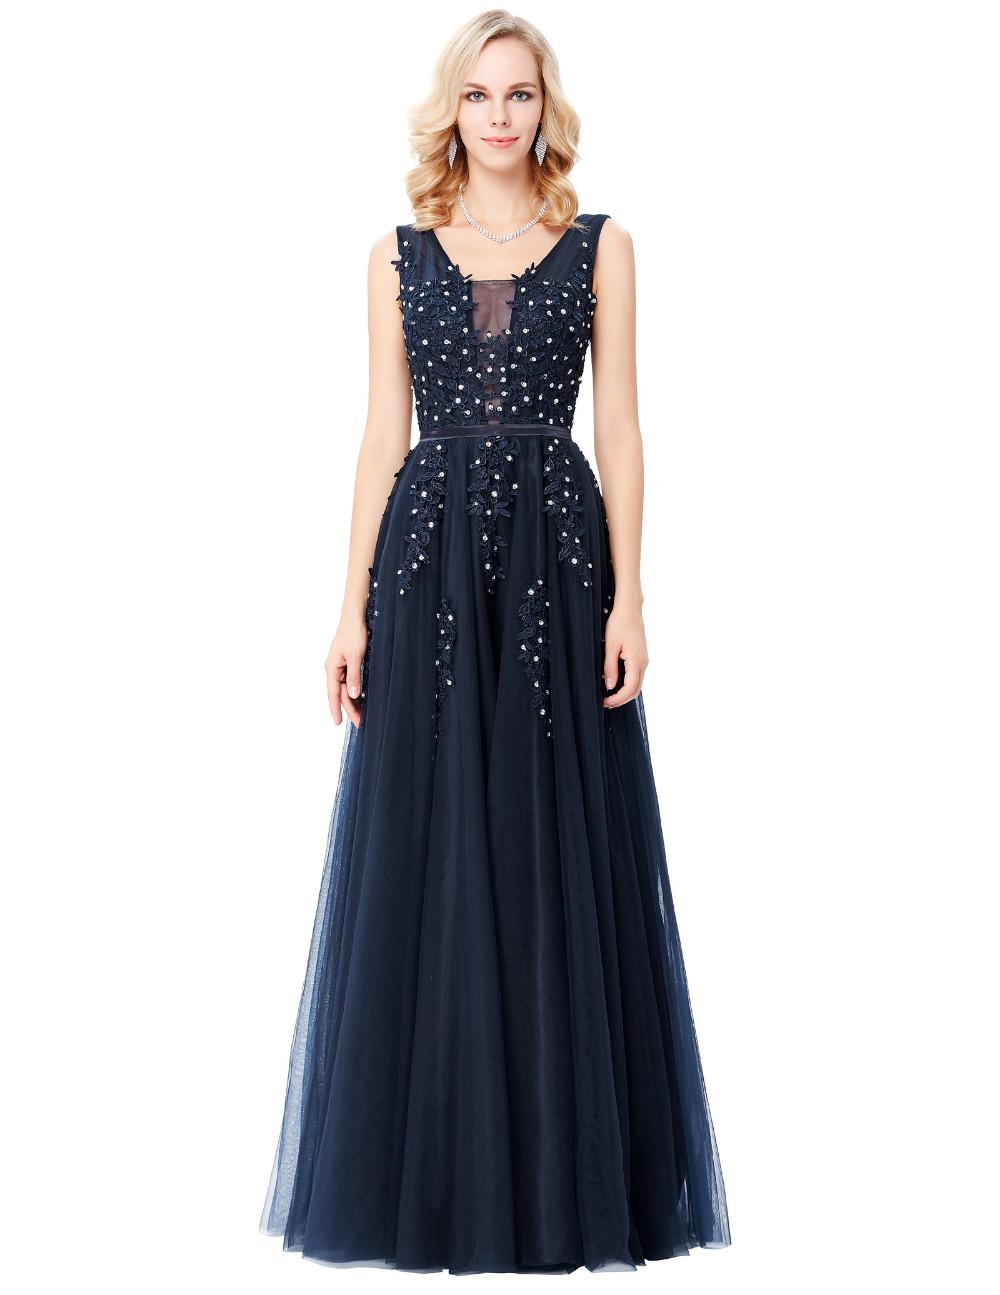 Grace Karin Tulle Appliques Celebrity Prom Dress Sexy V Back Sleeveless Long Royal Blue Robes De Soiree 2017 Longue Prom Dresses 7